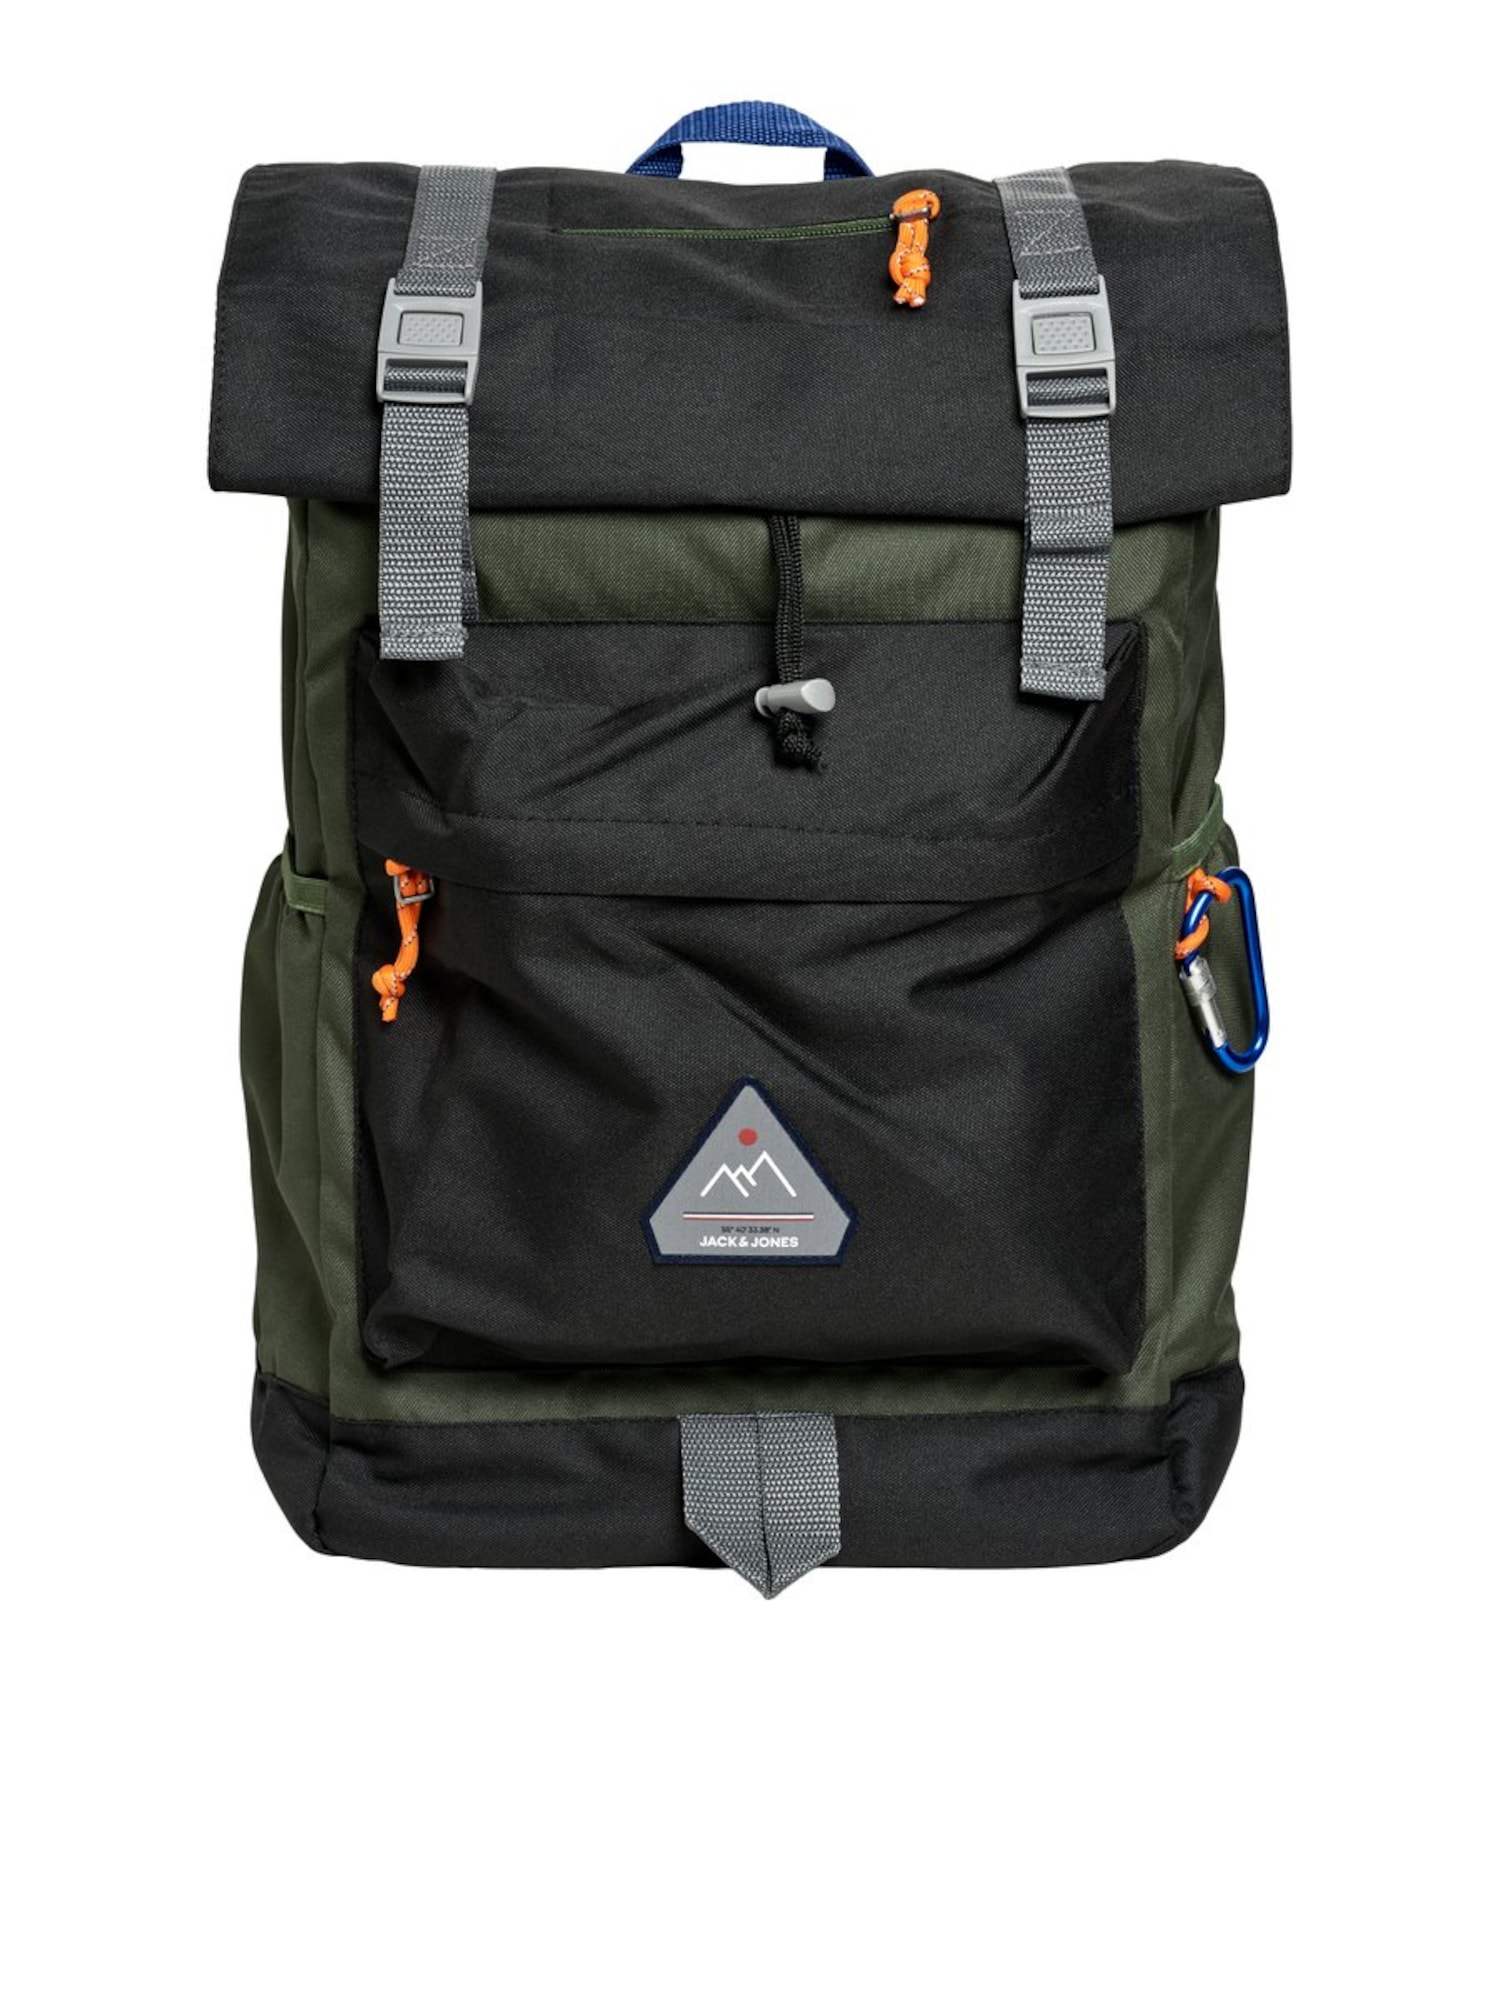 Rucksack | Taschen > Rucksäcke > Sonstige Rucksäcke | jack & jones